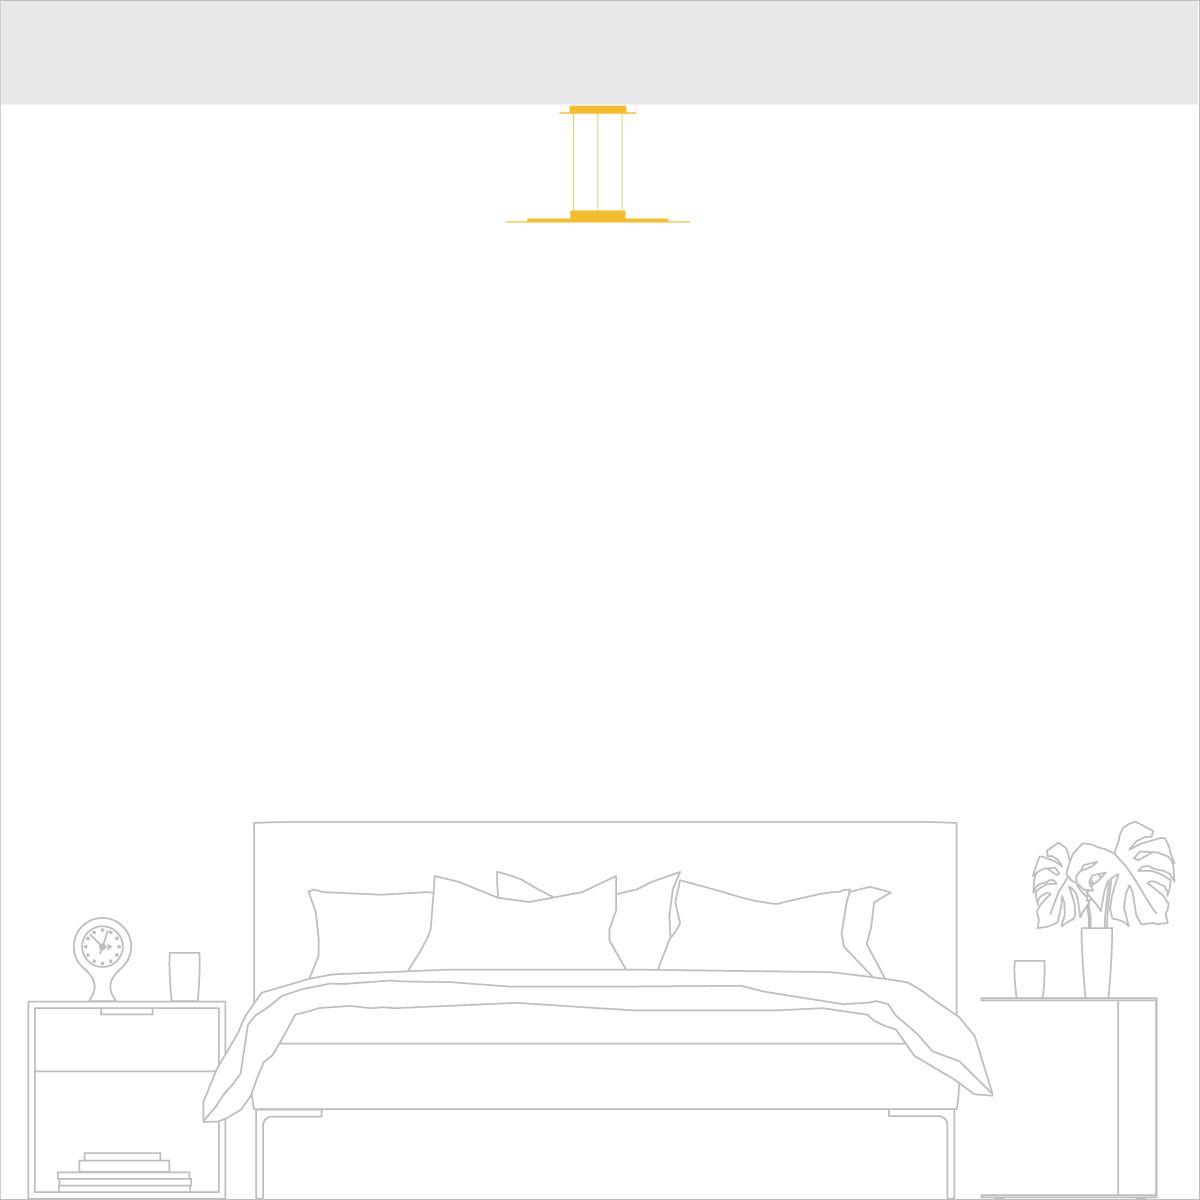 180521 minidisk dormitorio